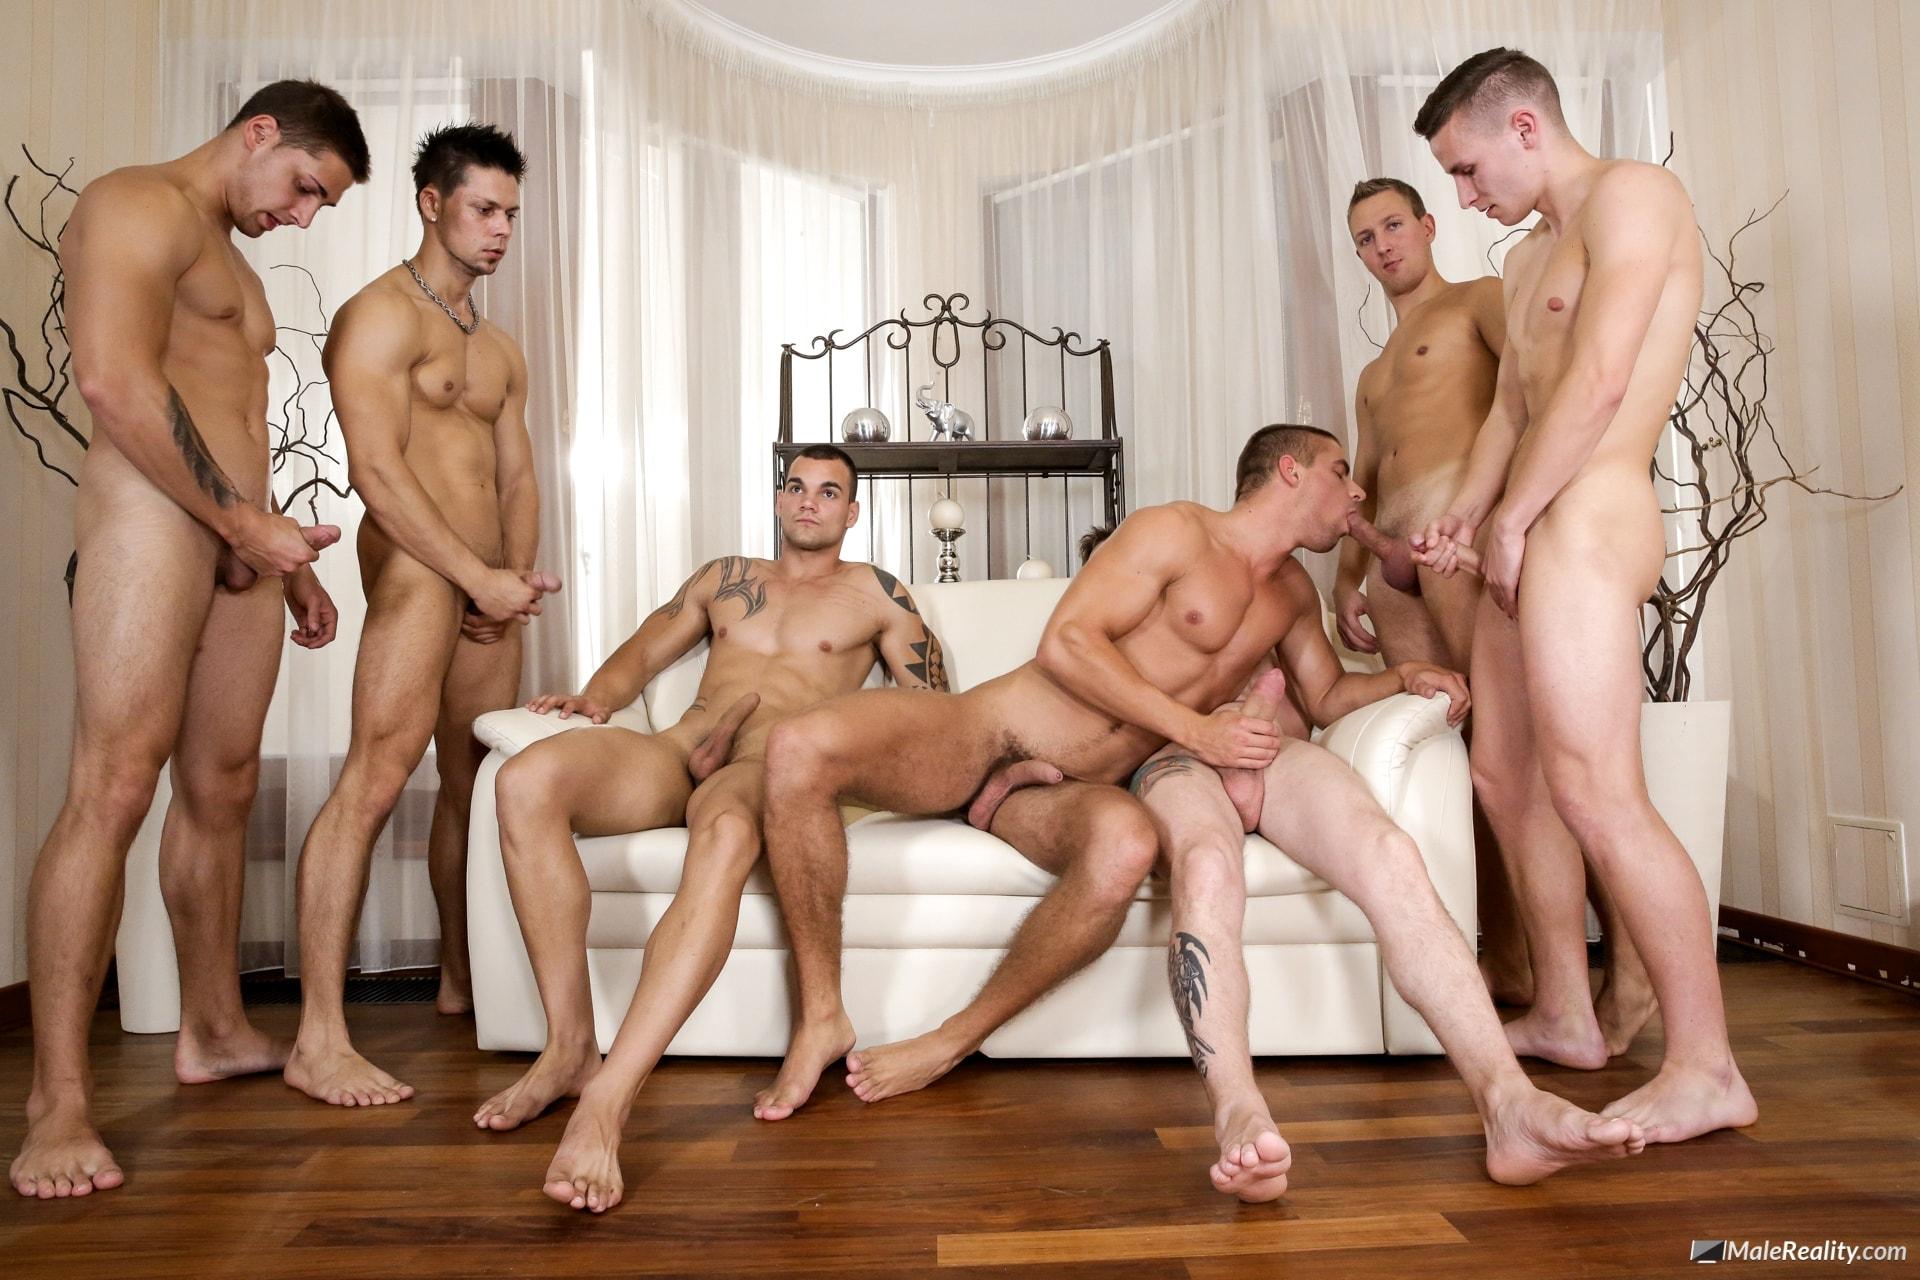 Arny Donan Orgy Gay Porn gaykkake #03, scene #01